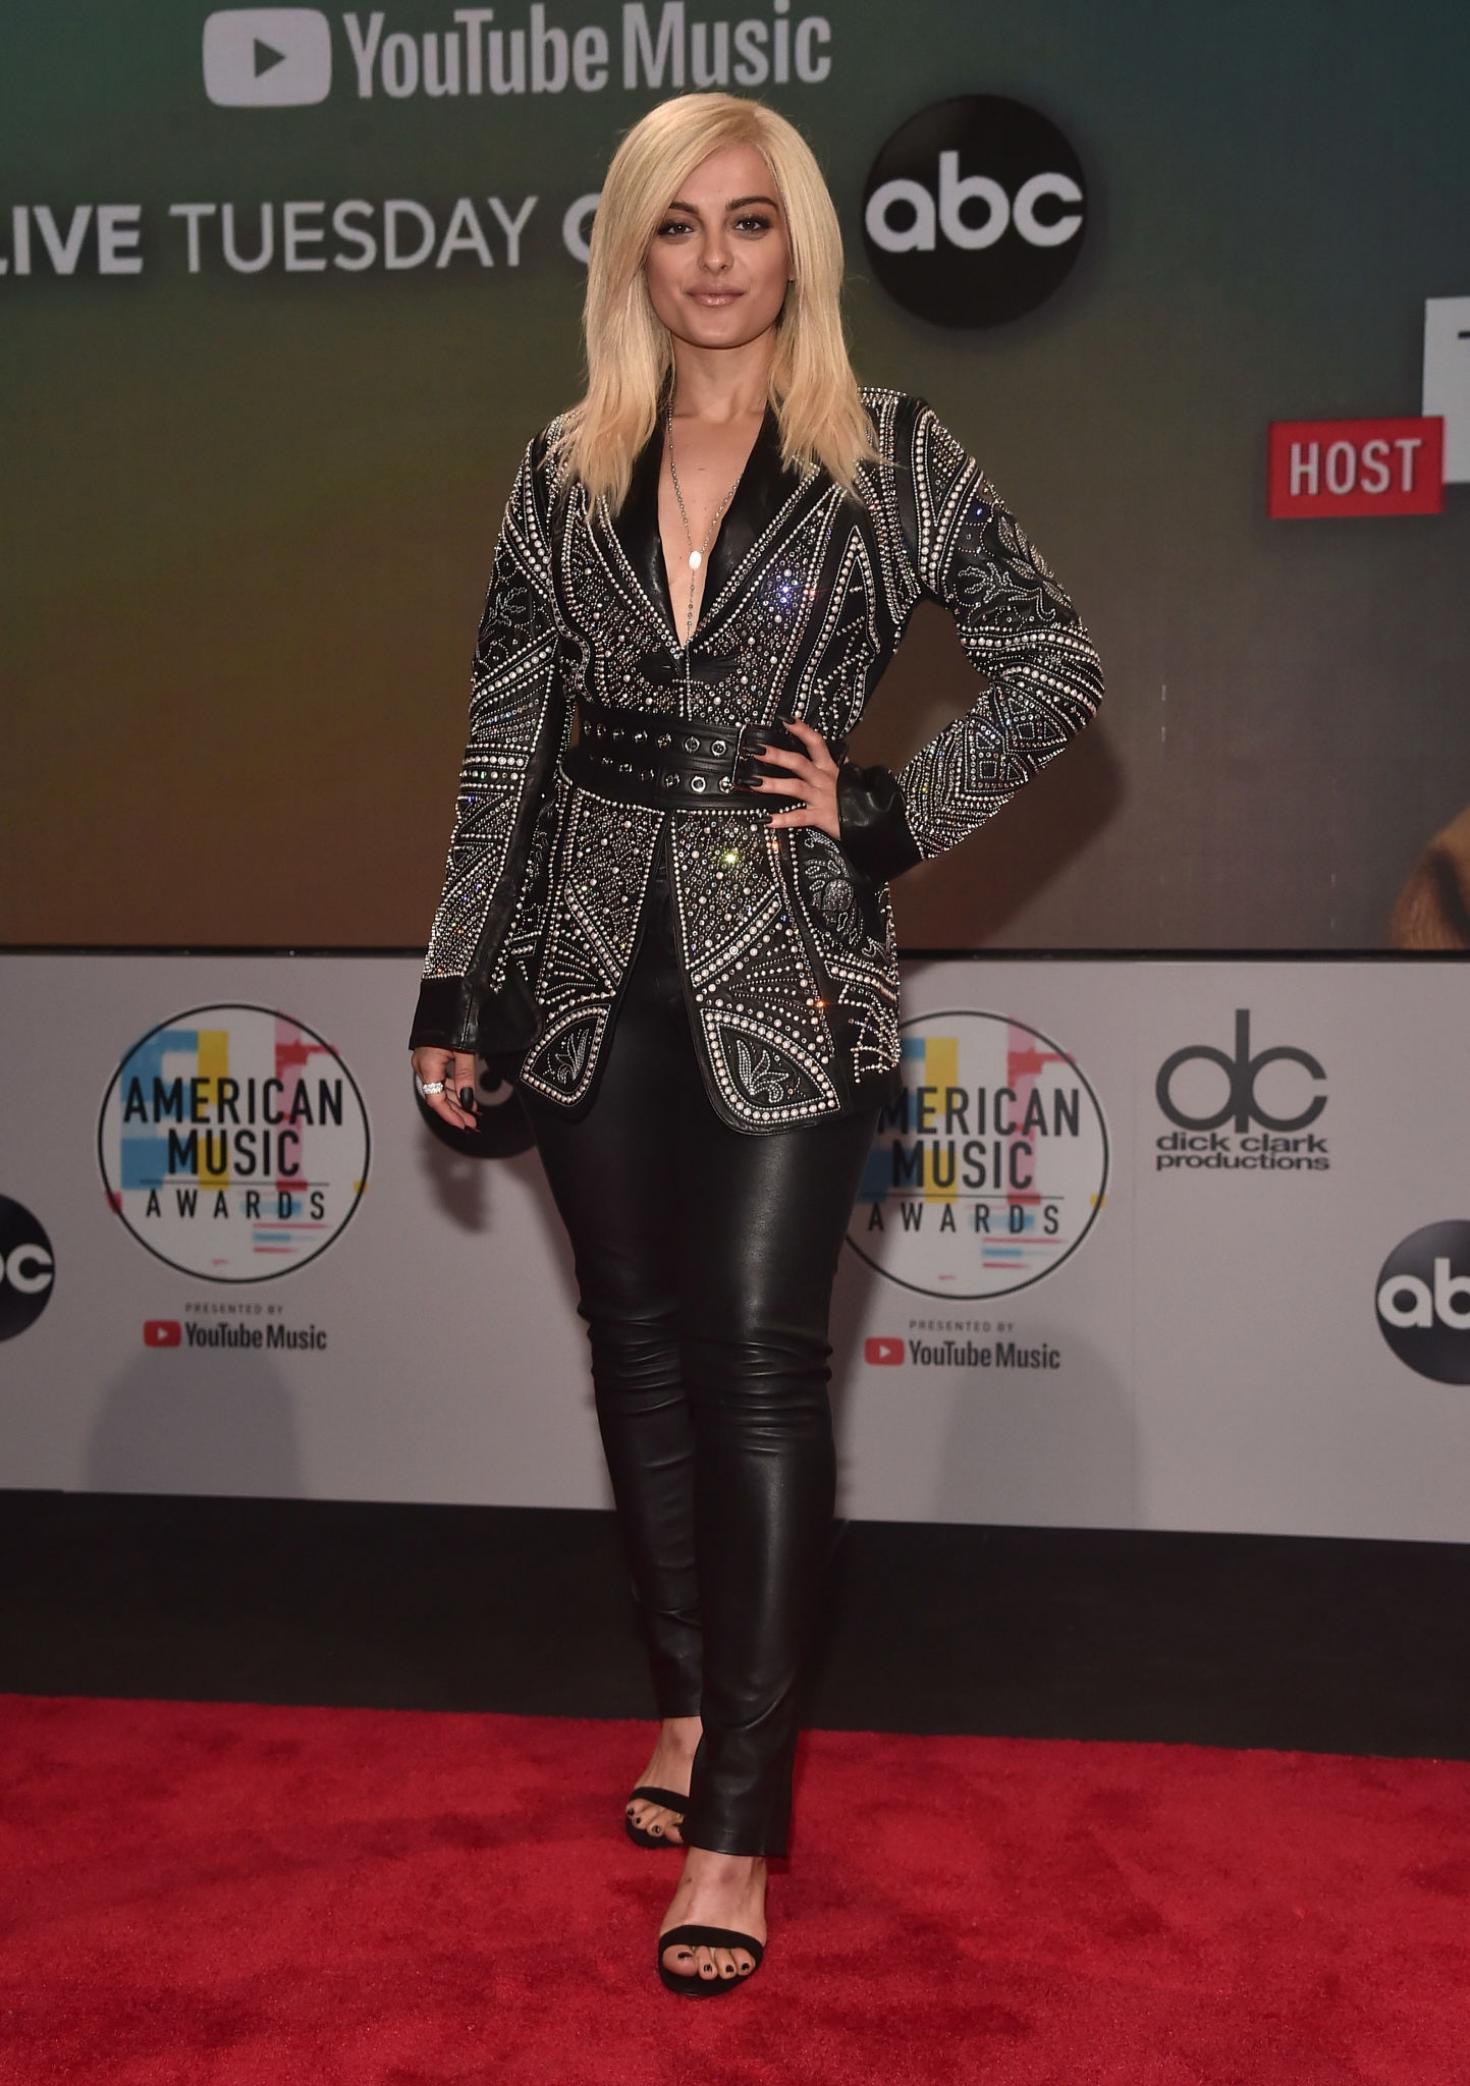 Bebe Rexha 2018 : Bebe Rexha: 2018 American Music Awards Nominations Announcement -01